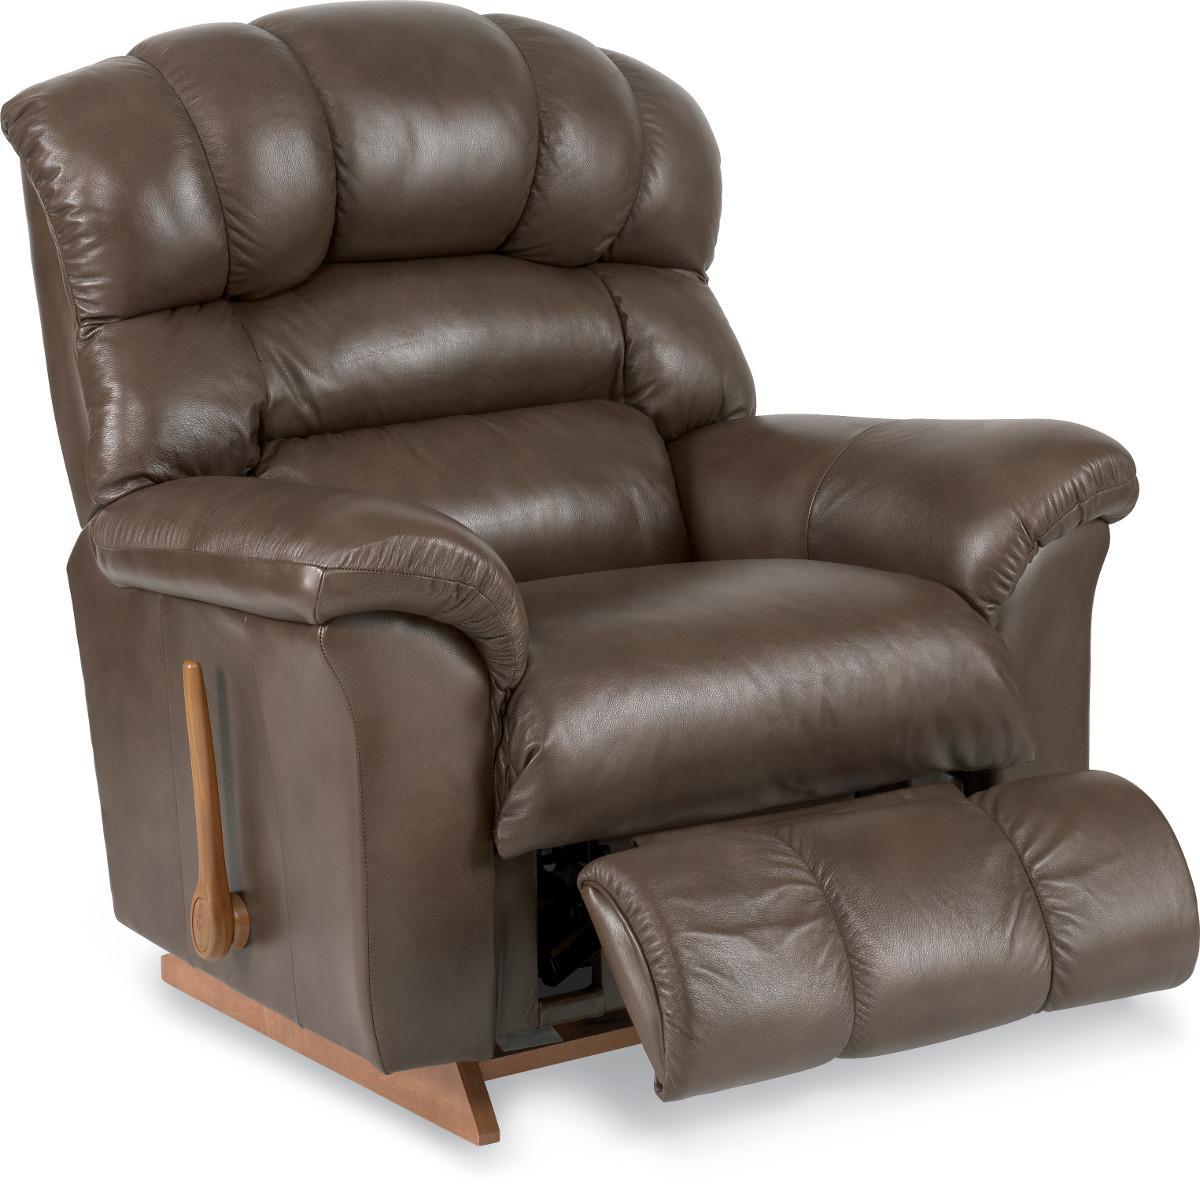 Charmant Reclining Chair; La Z Boy Rocker ReclinerReclina Rocker?